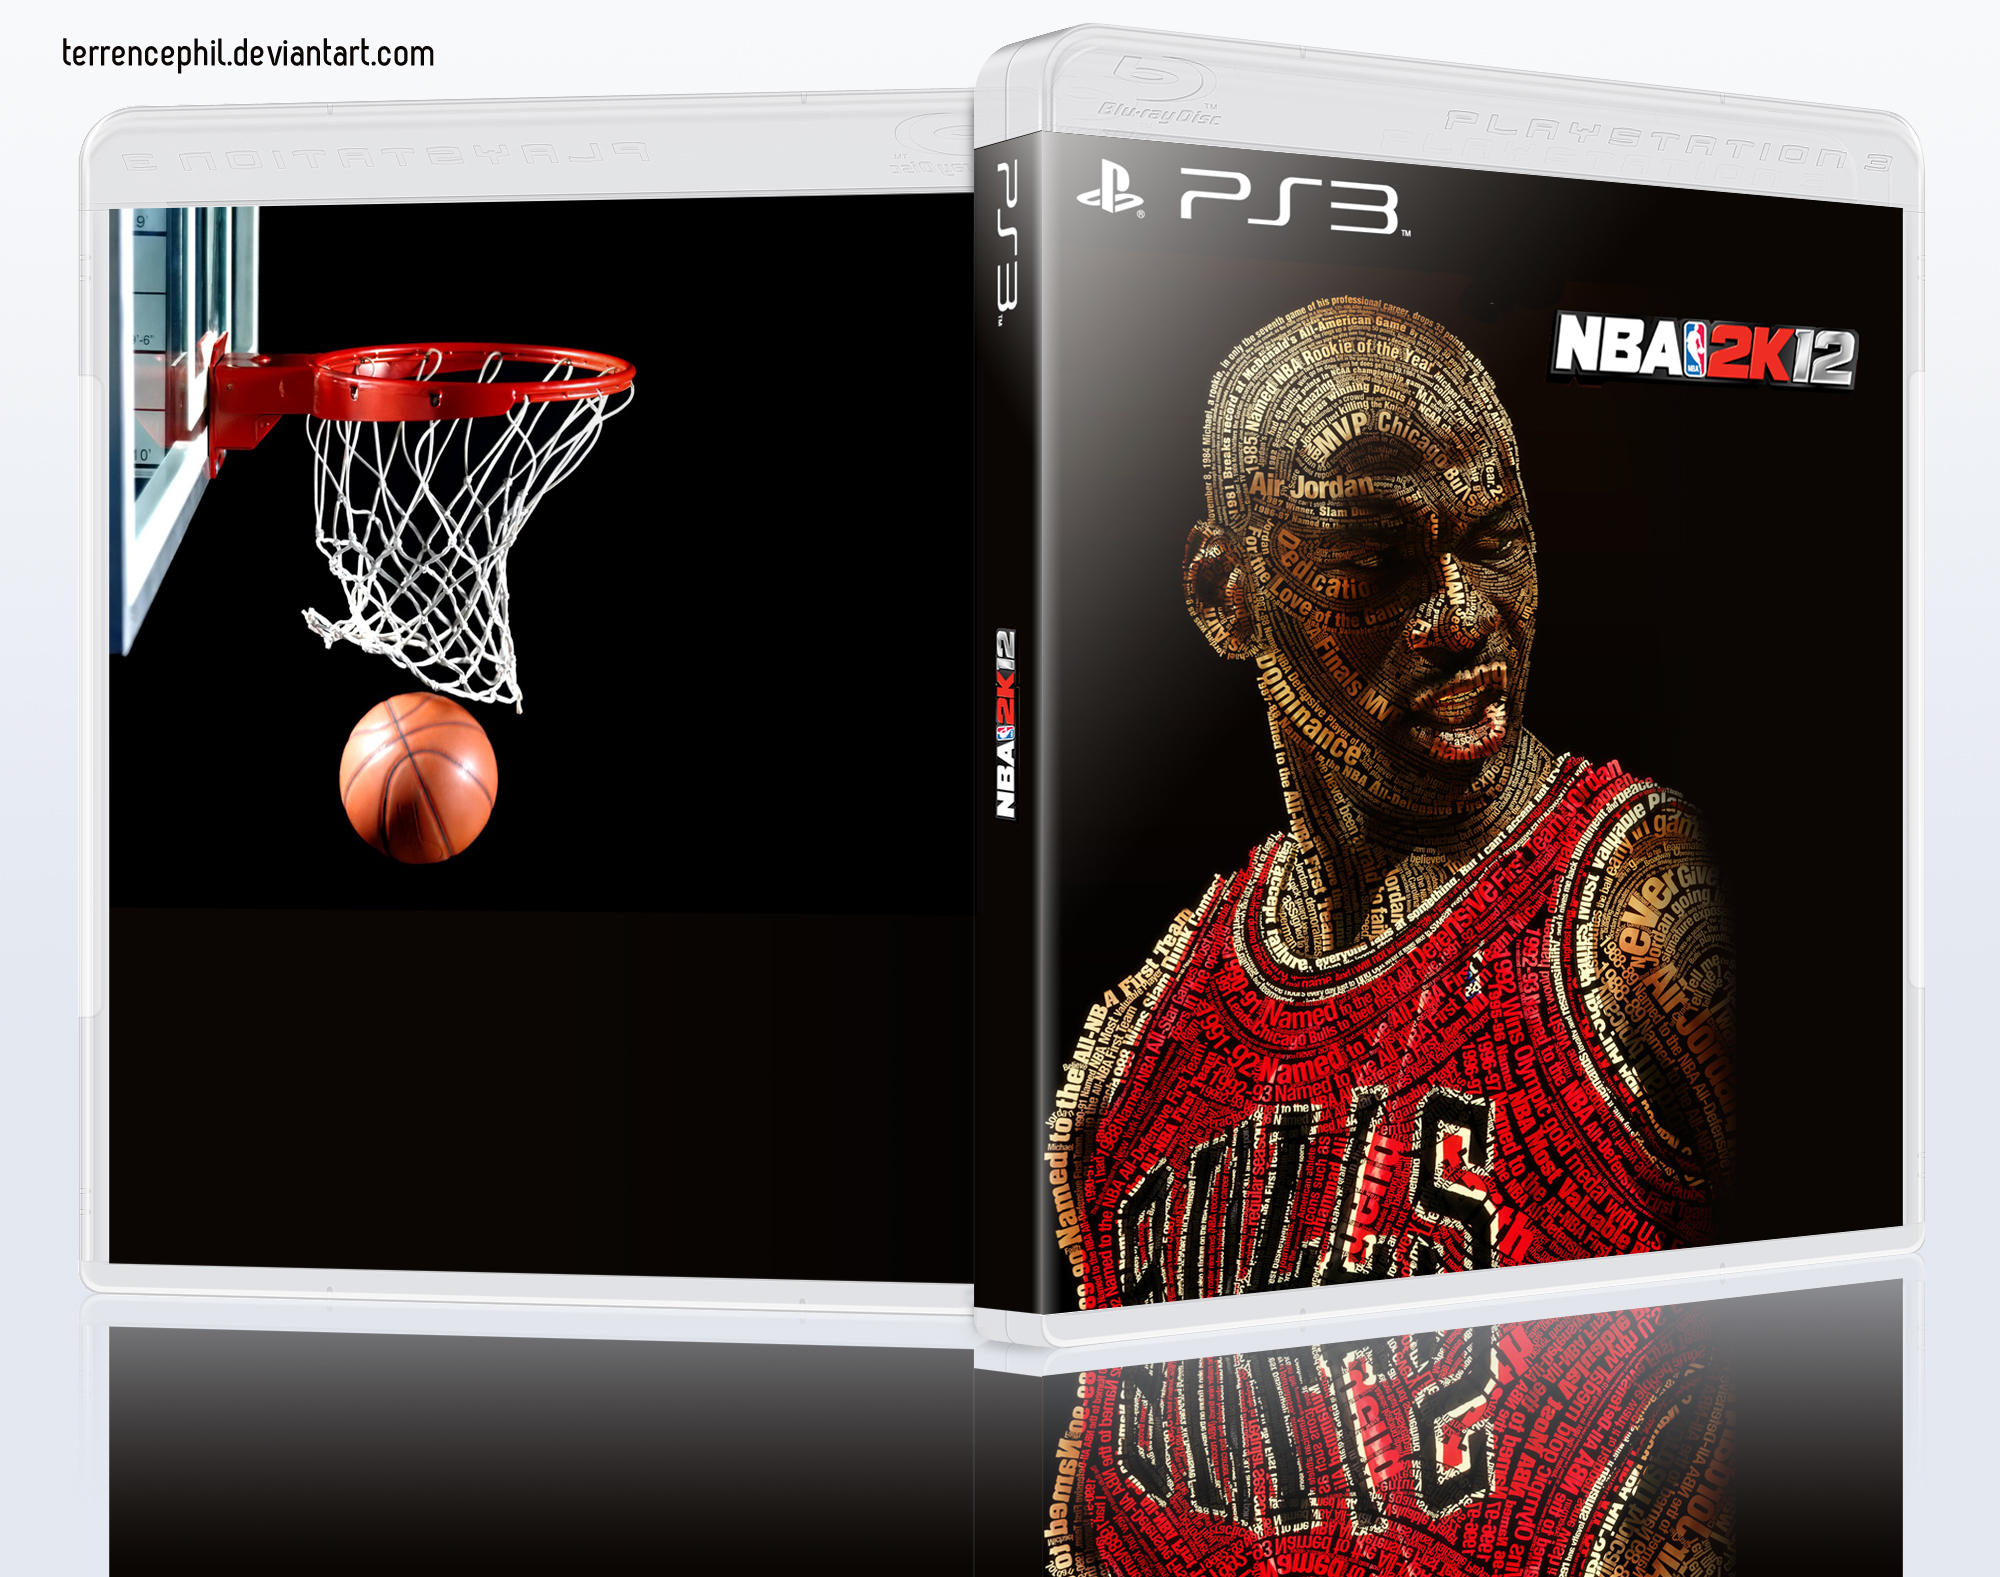 NBA 2K12 PlayStation 3 Box Art by terrencephil